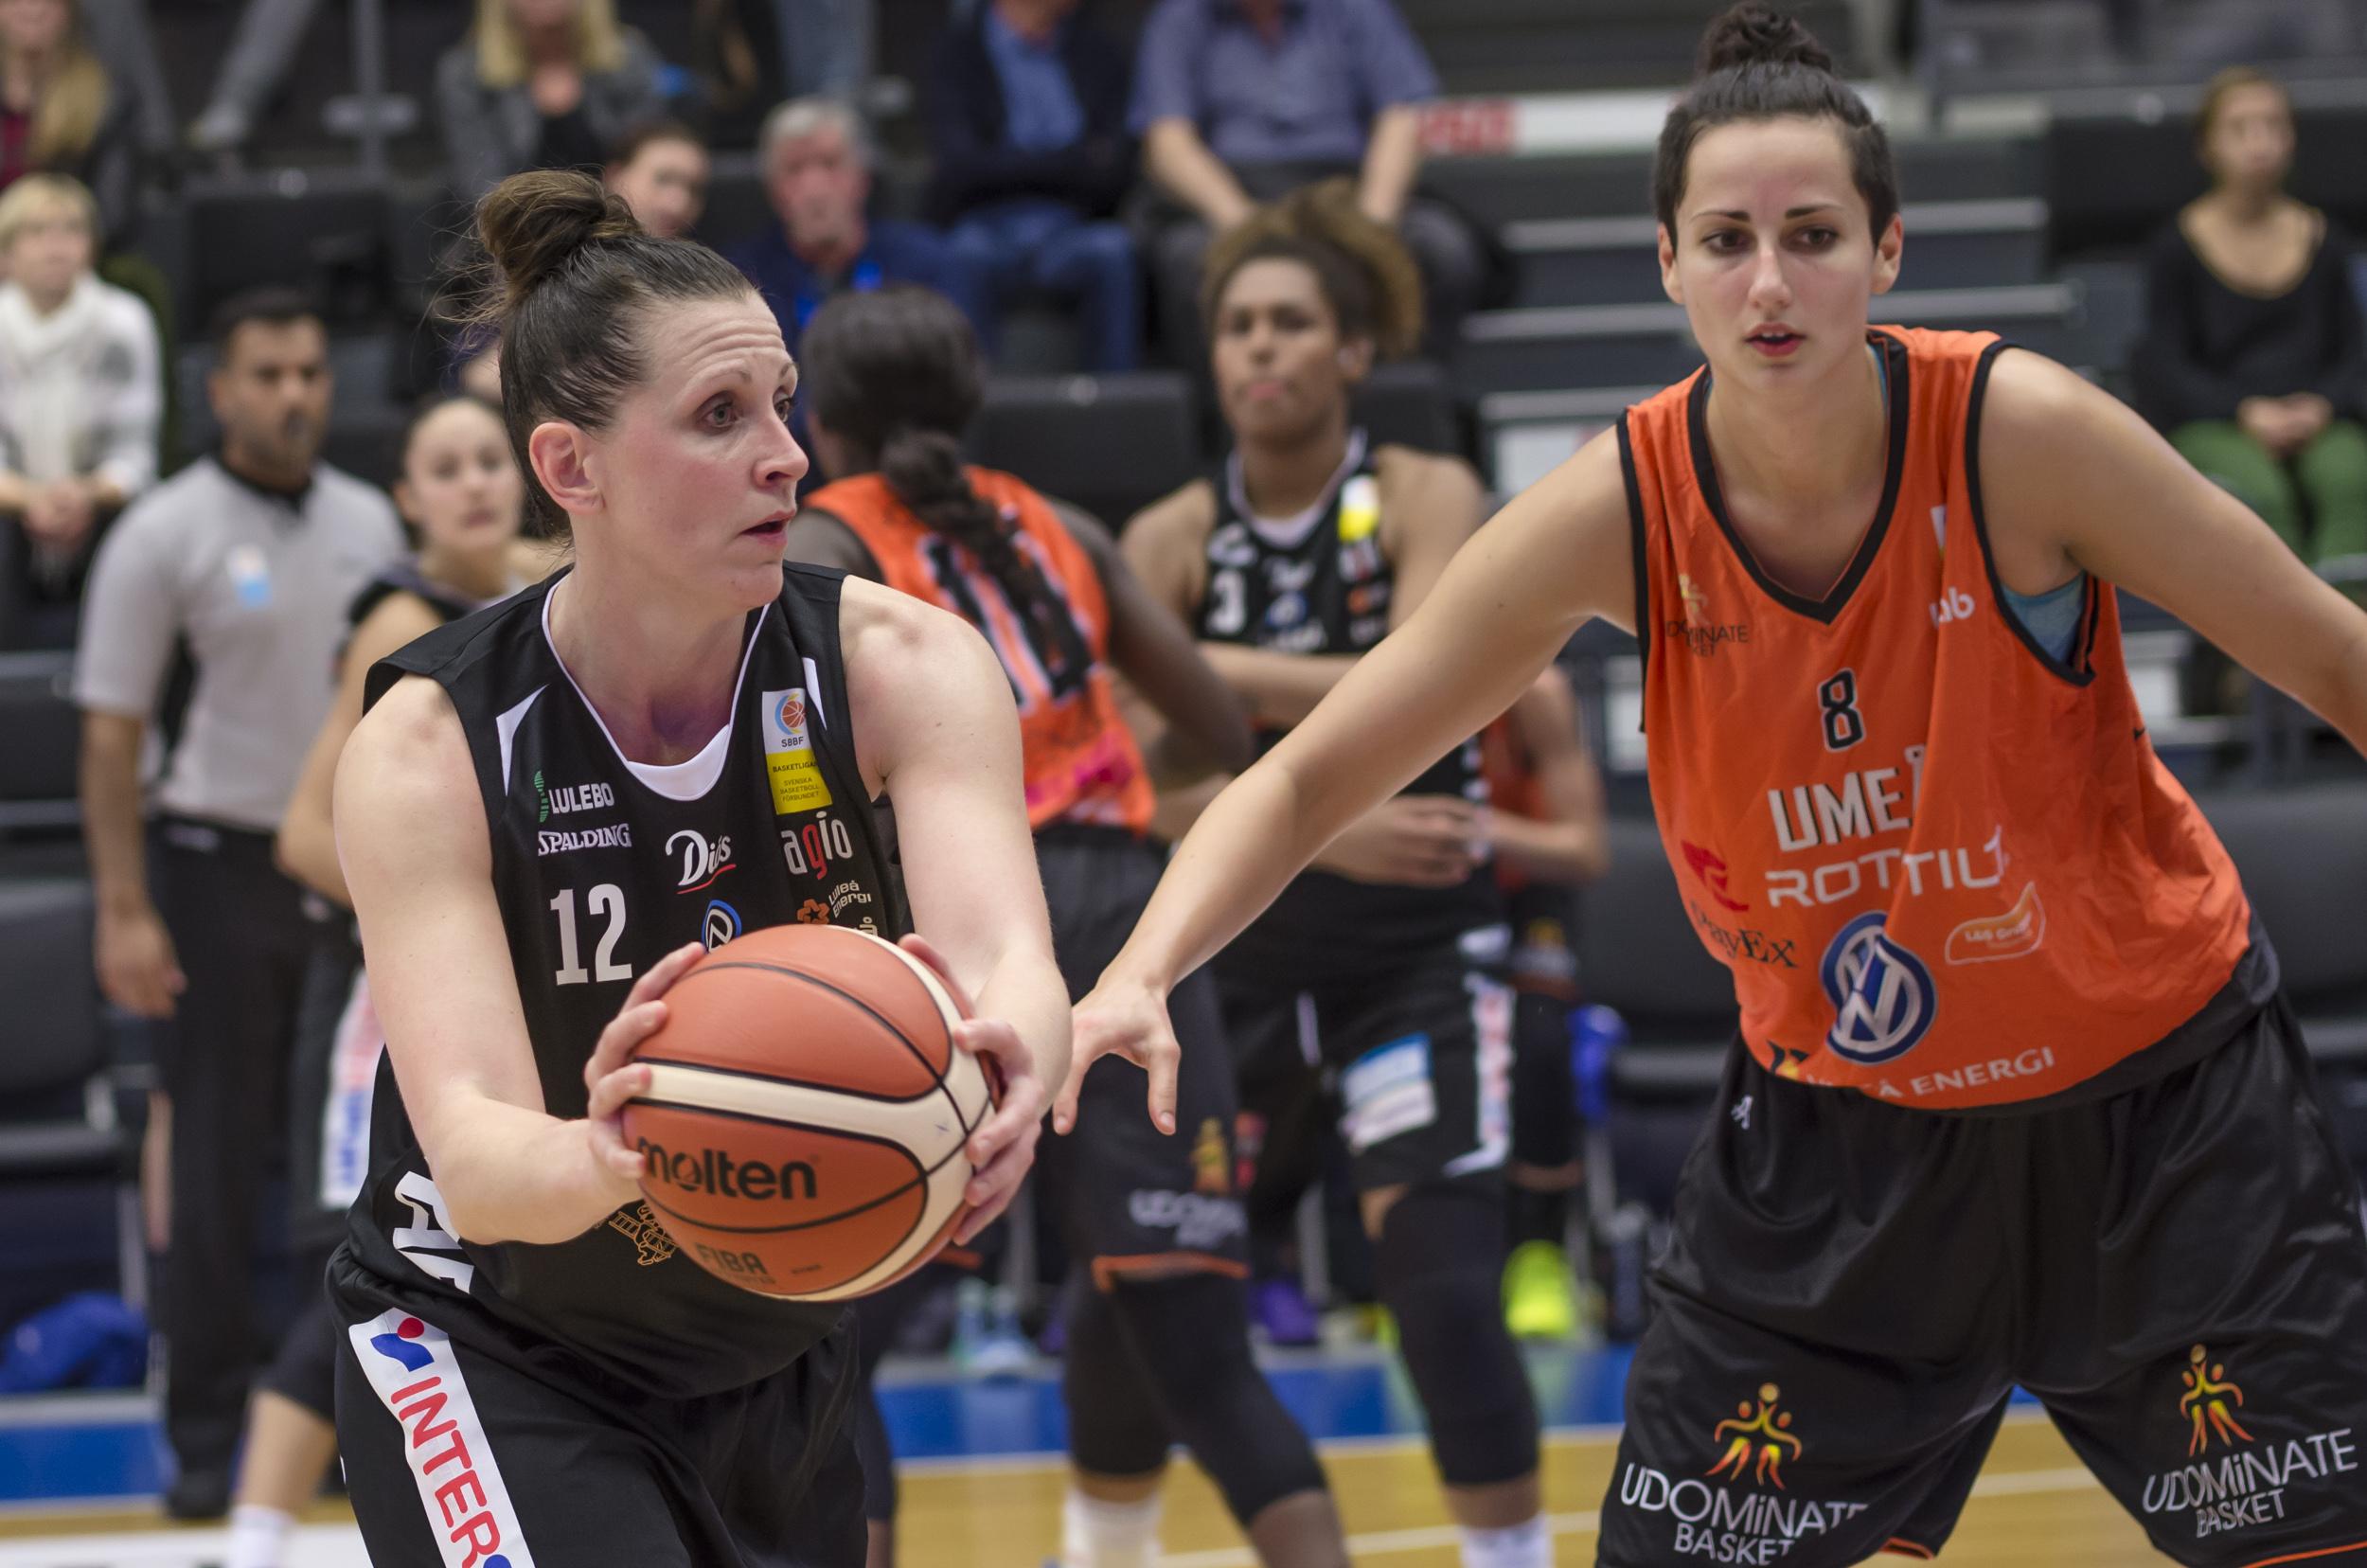 Luleå Basket vs Udominate